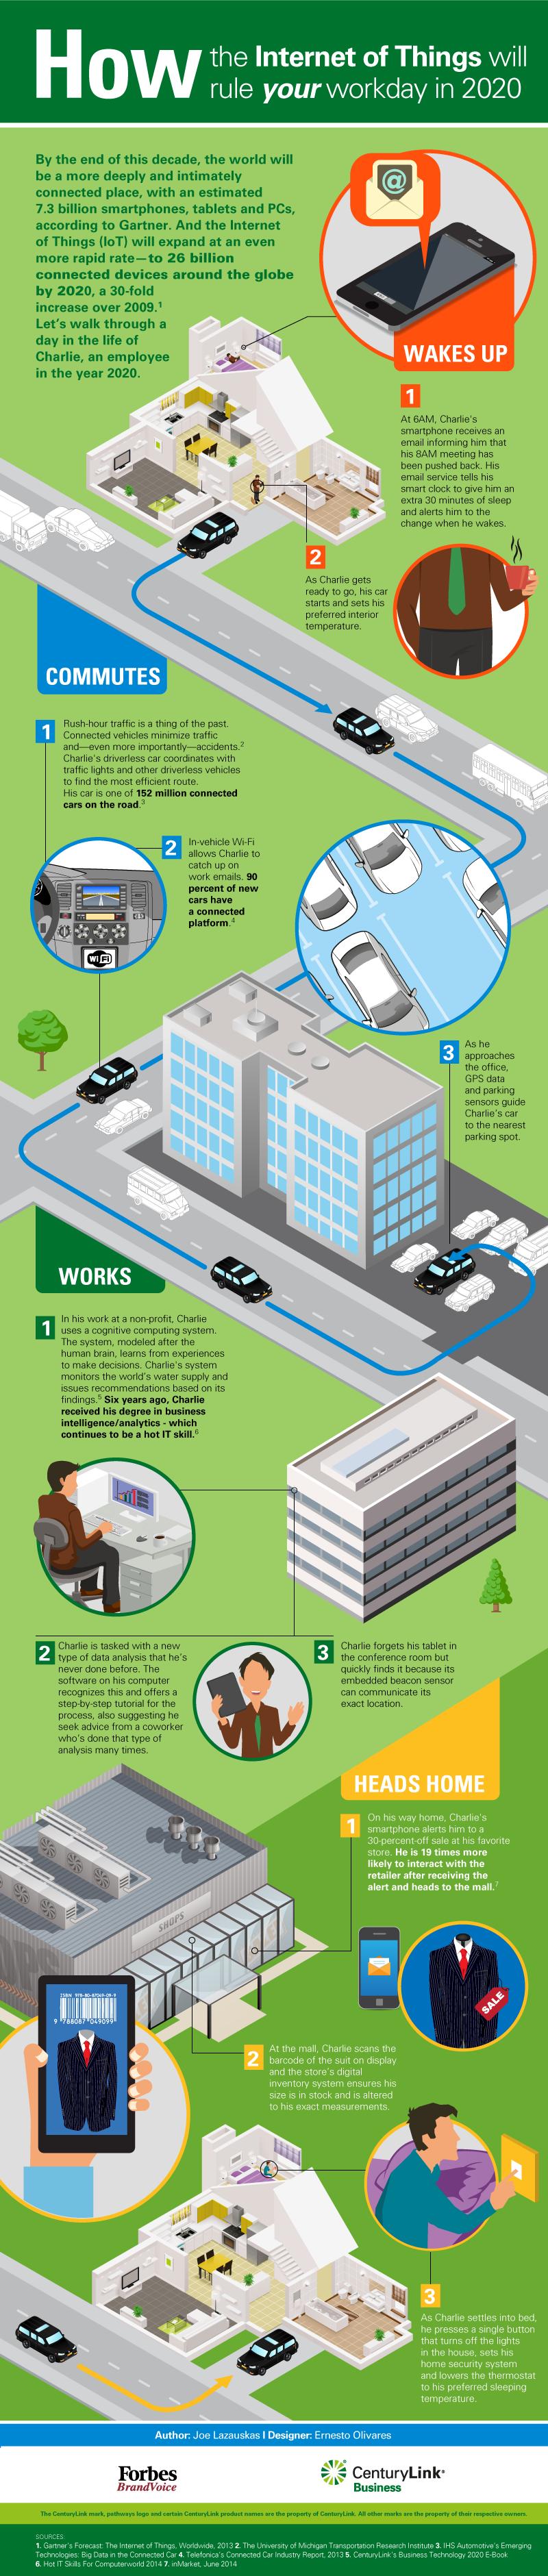 century-link_infographic1